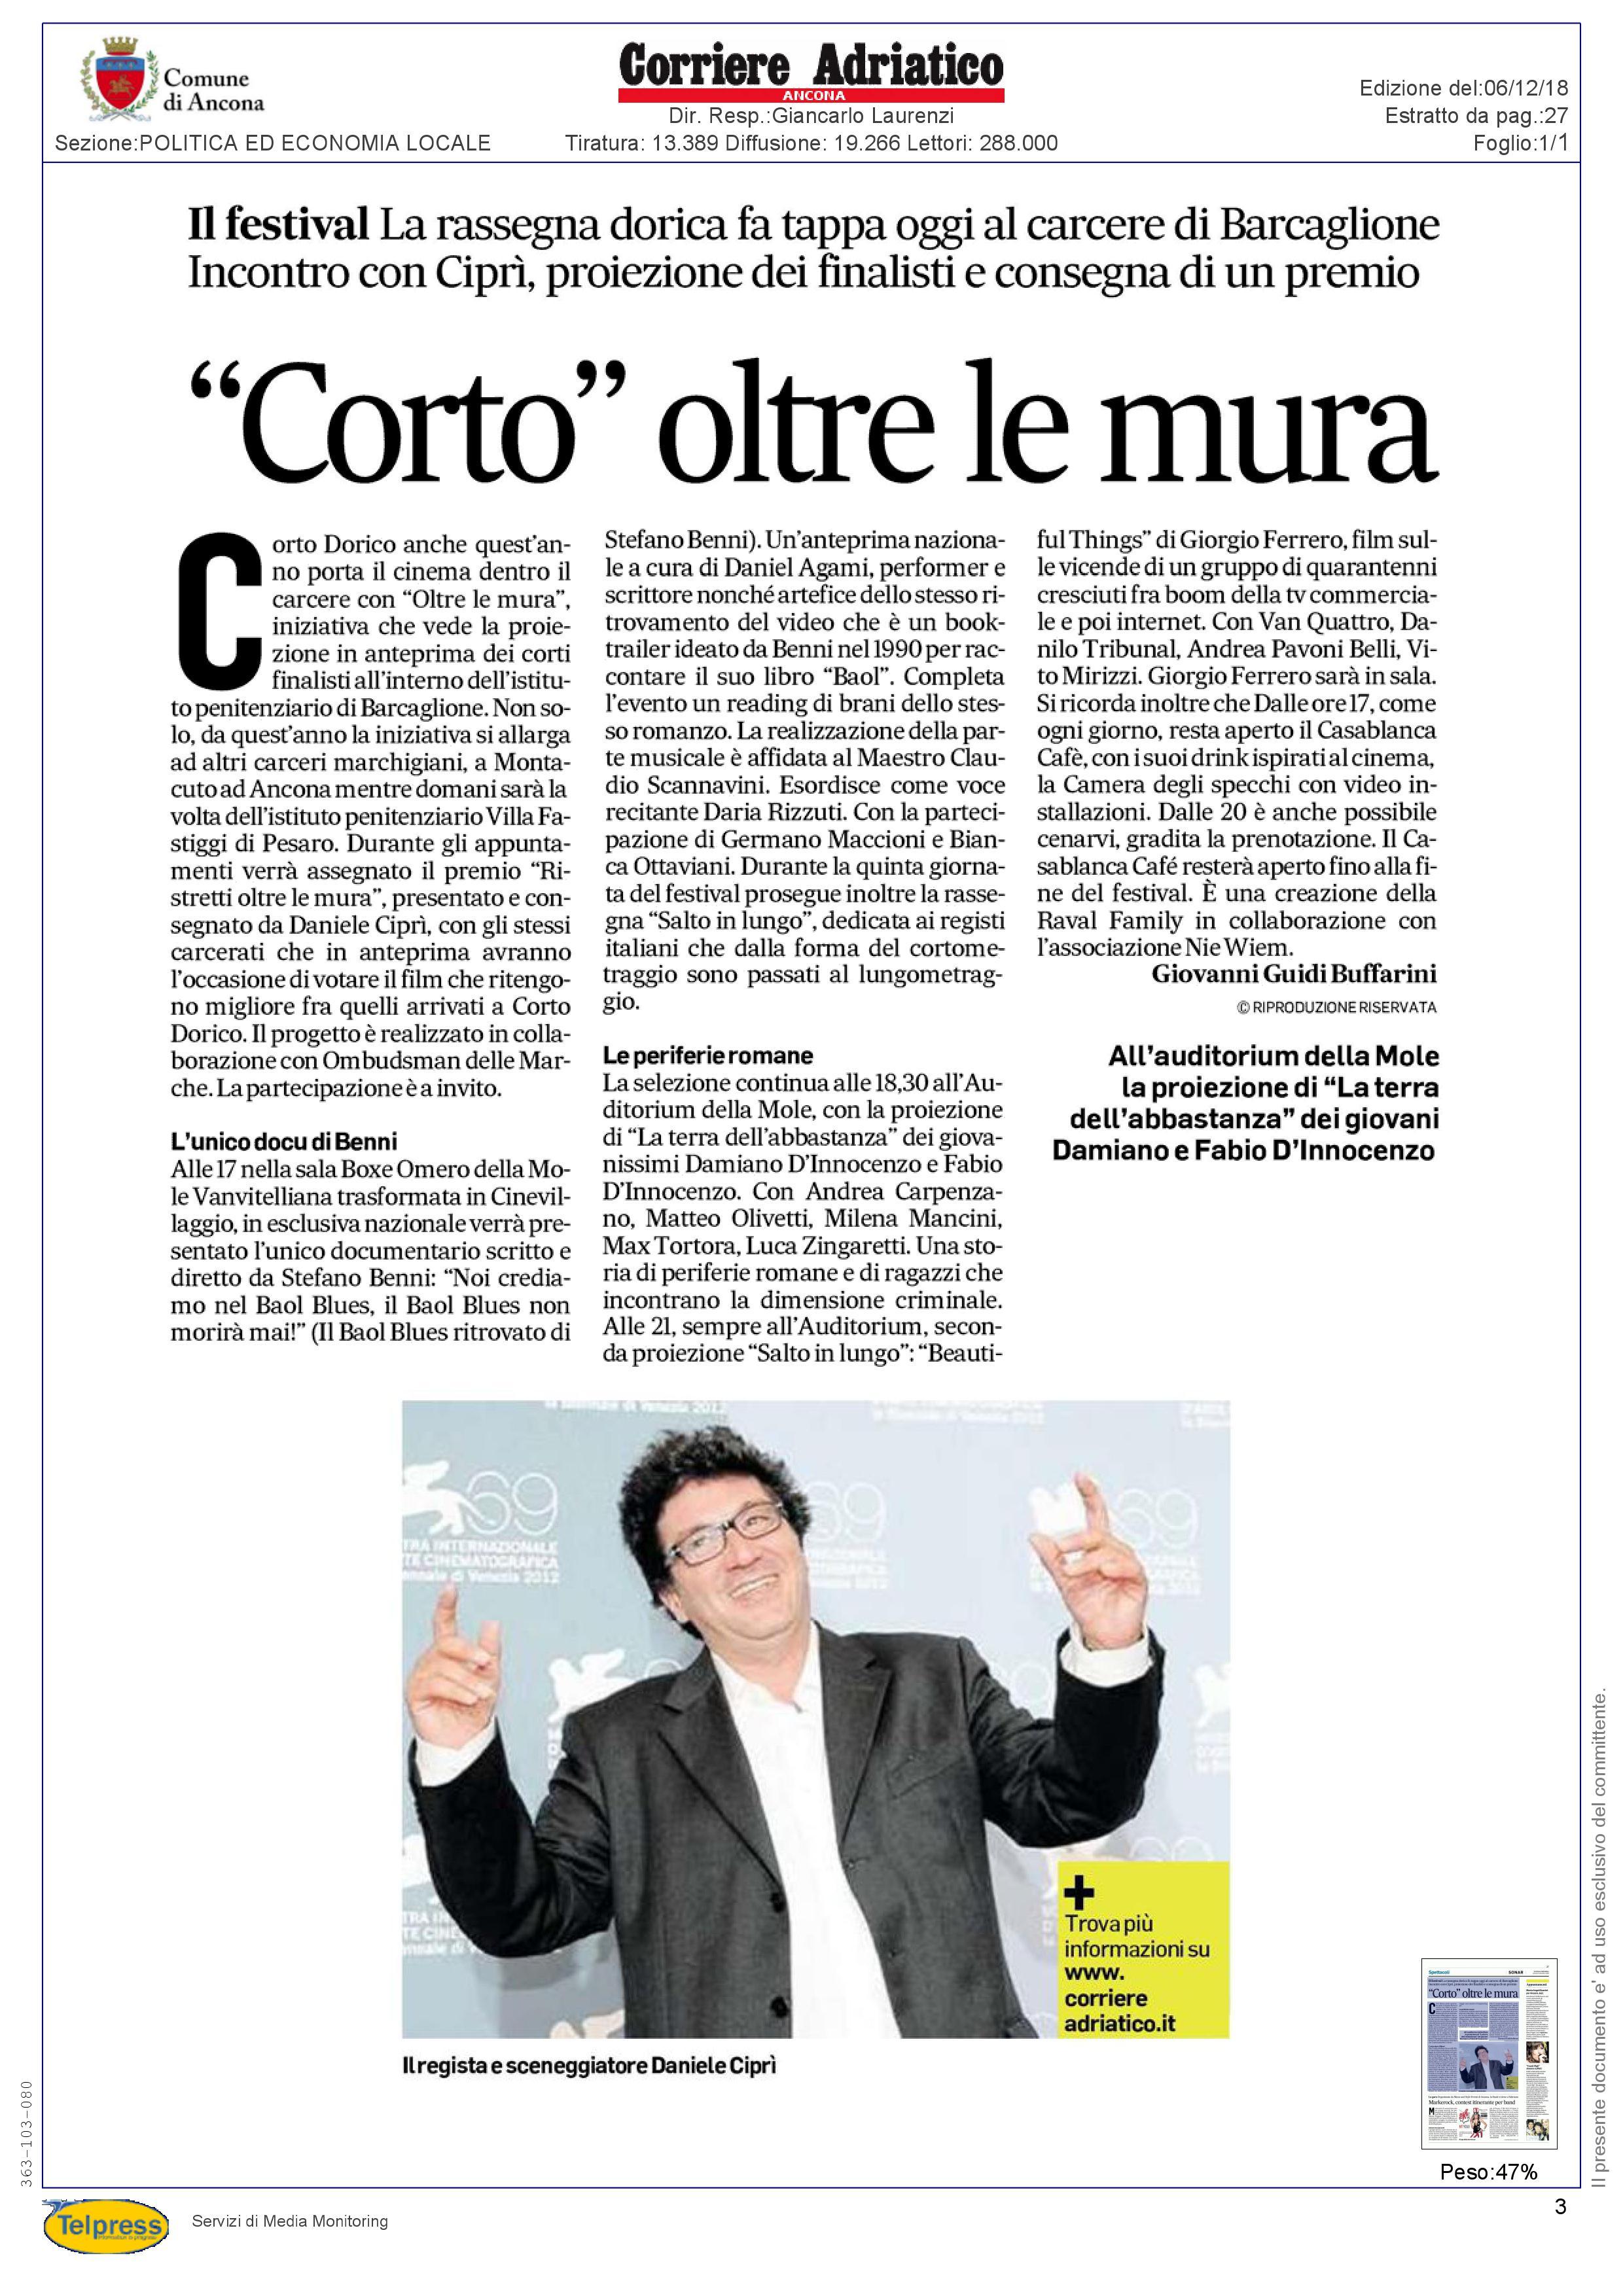 6-12-18 Corriere Adriatico